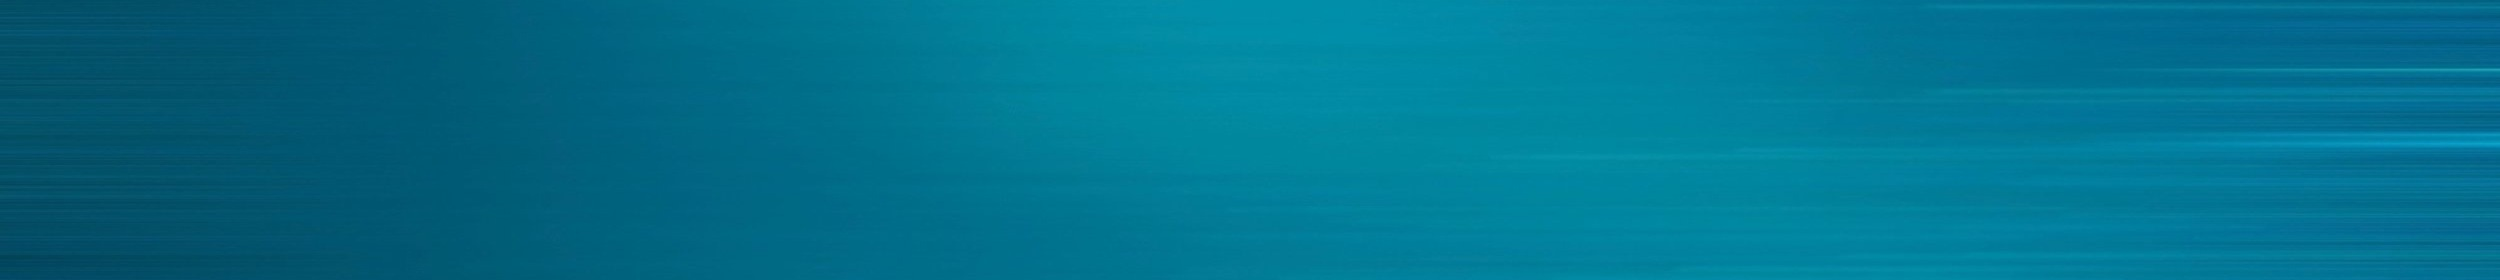 unsplash+horizontal.jpg